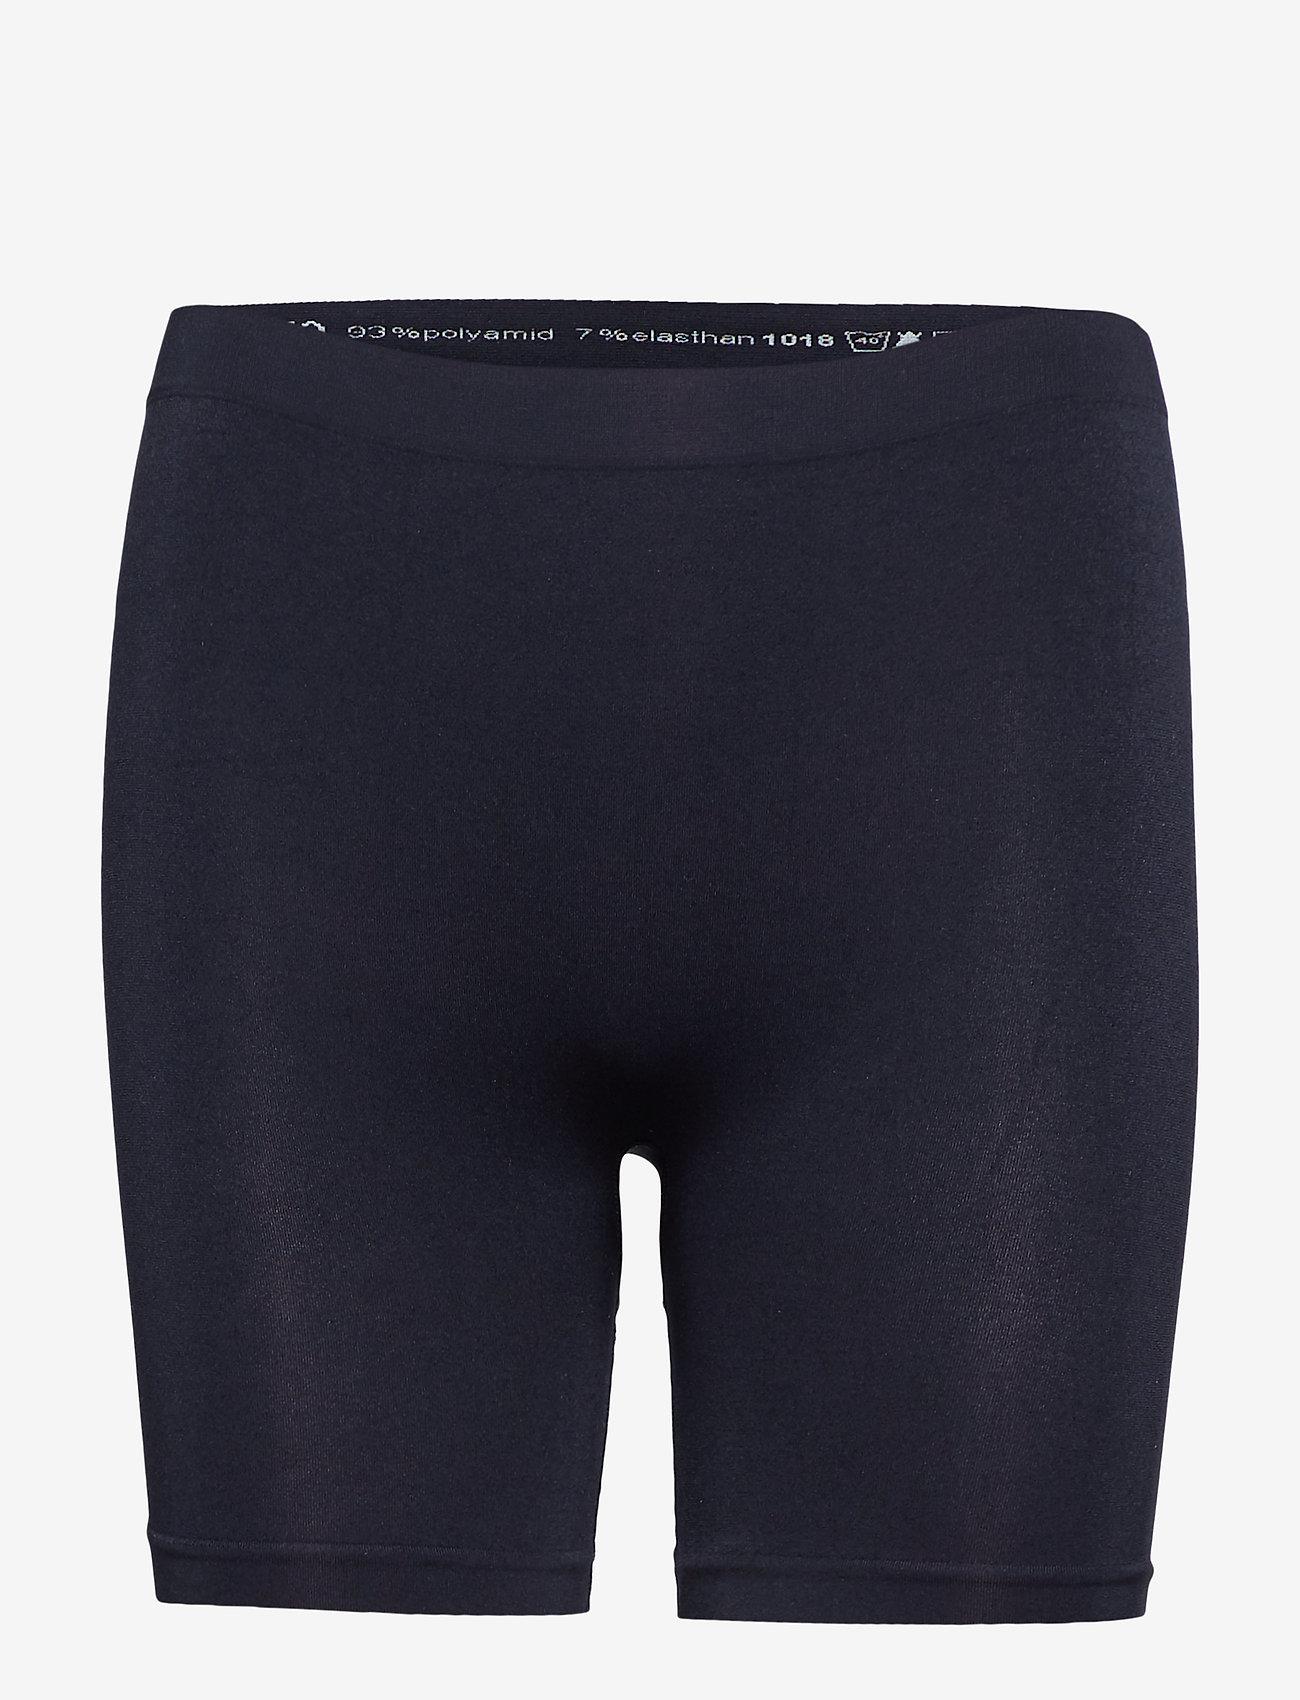 Missya - Lucia shorts - broekjes - black - 0